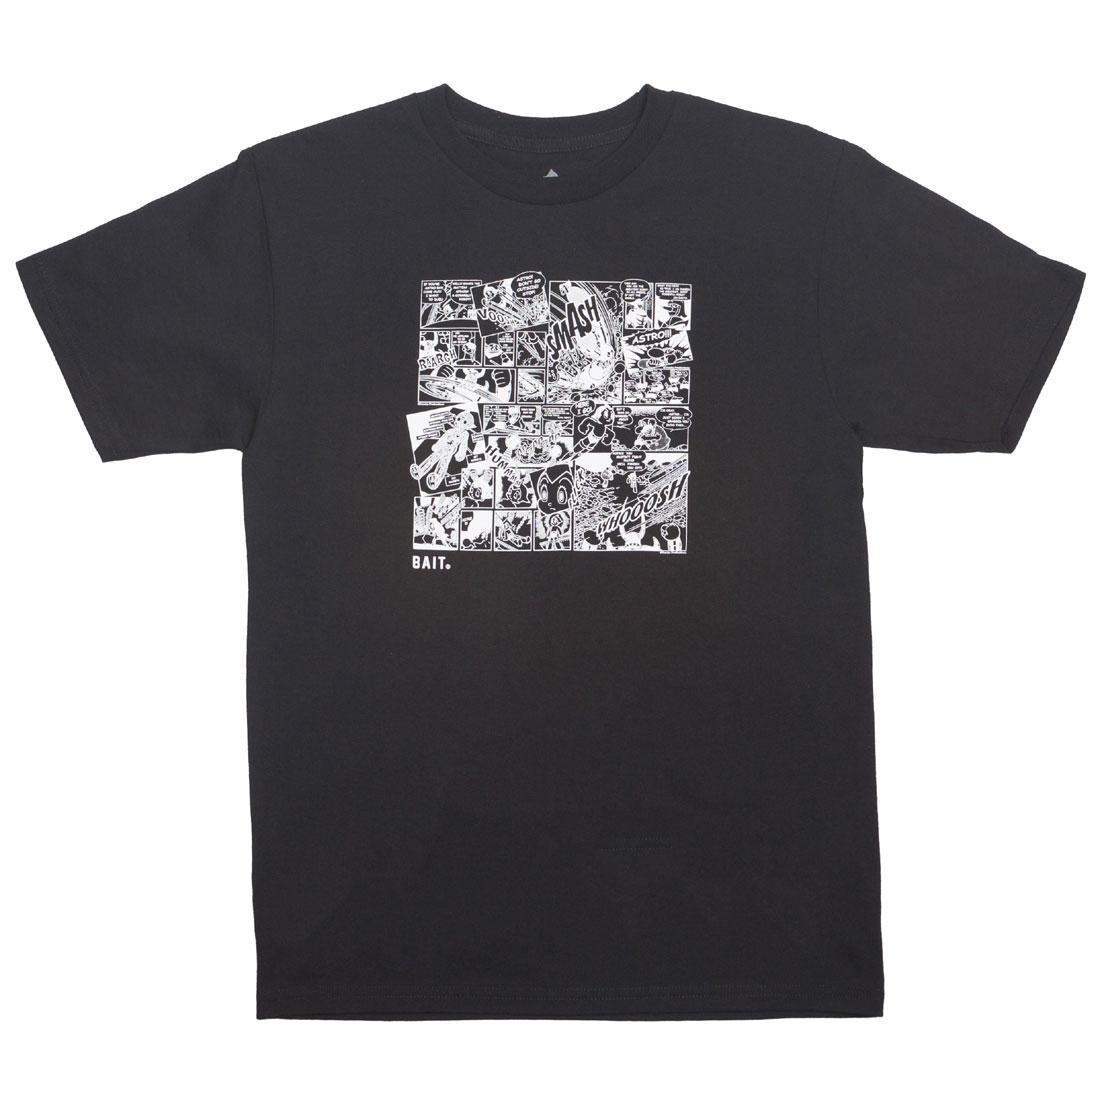 BAIT x Astro Boy Men Manga Tee (black)